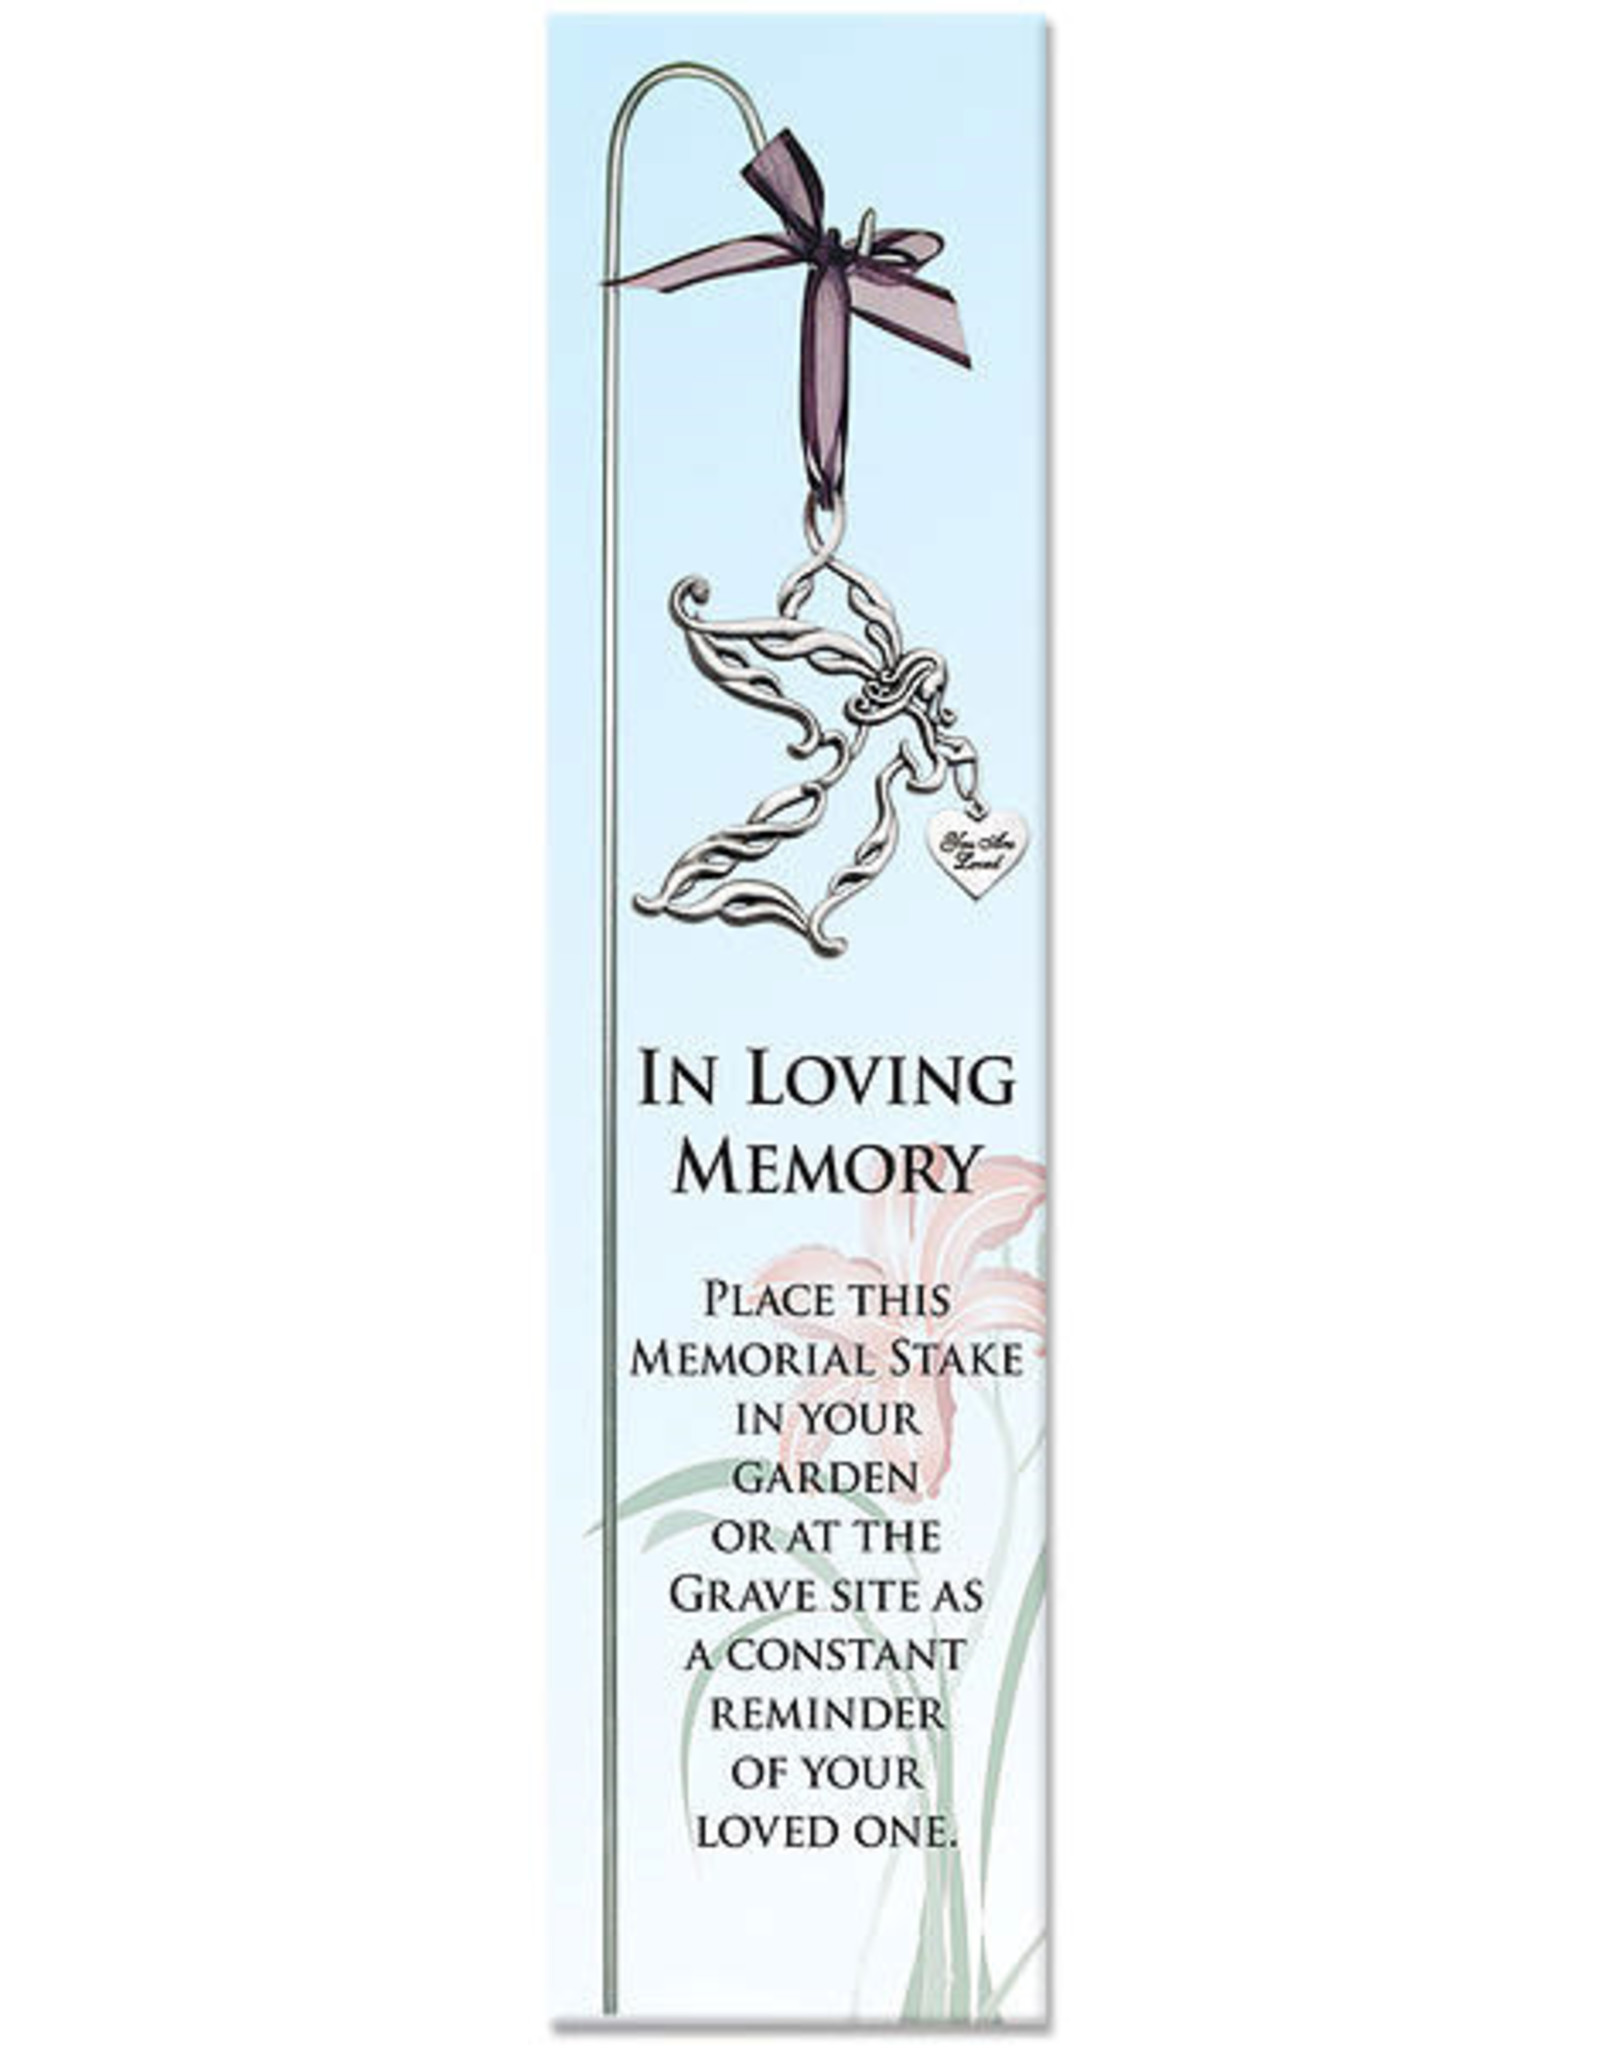 Angel Memorial Garden Stake (In Loving Memory)